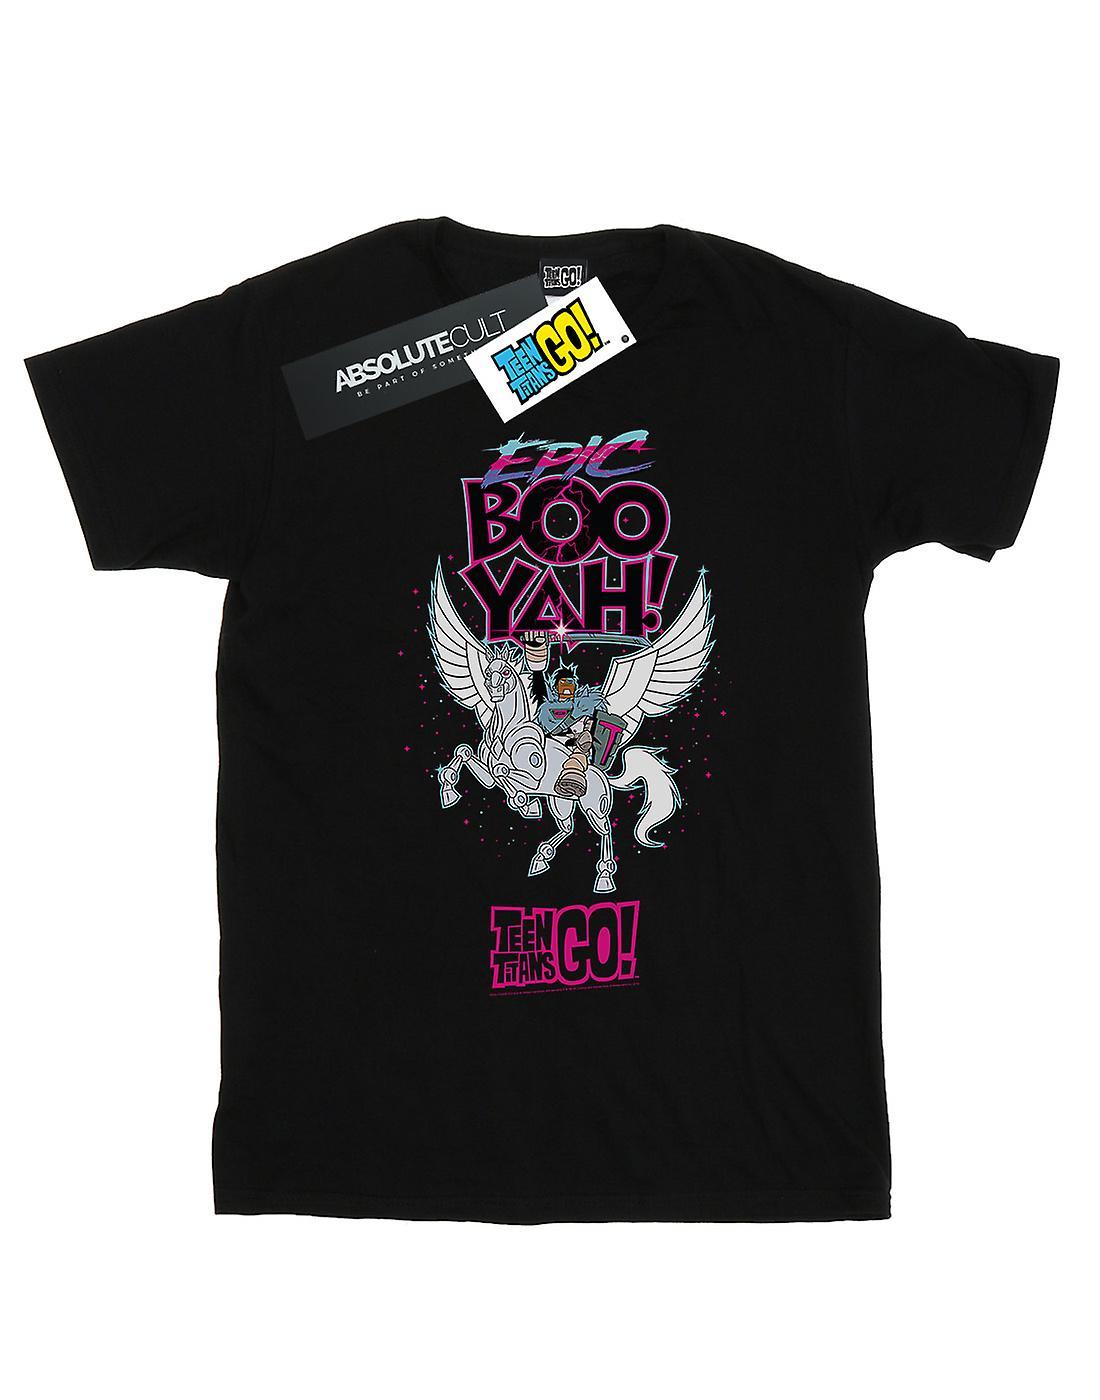 DC Comics Boys Teen Titans Go Epic Boo Yah T-Shirt